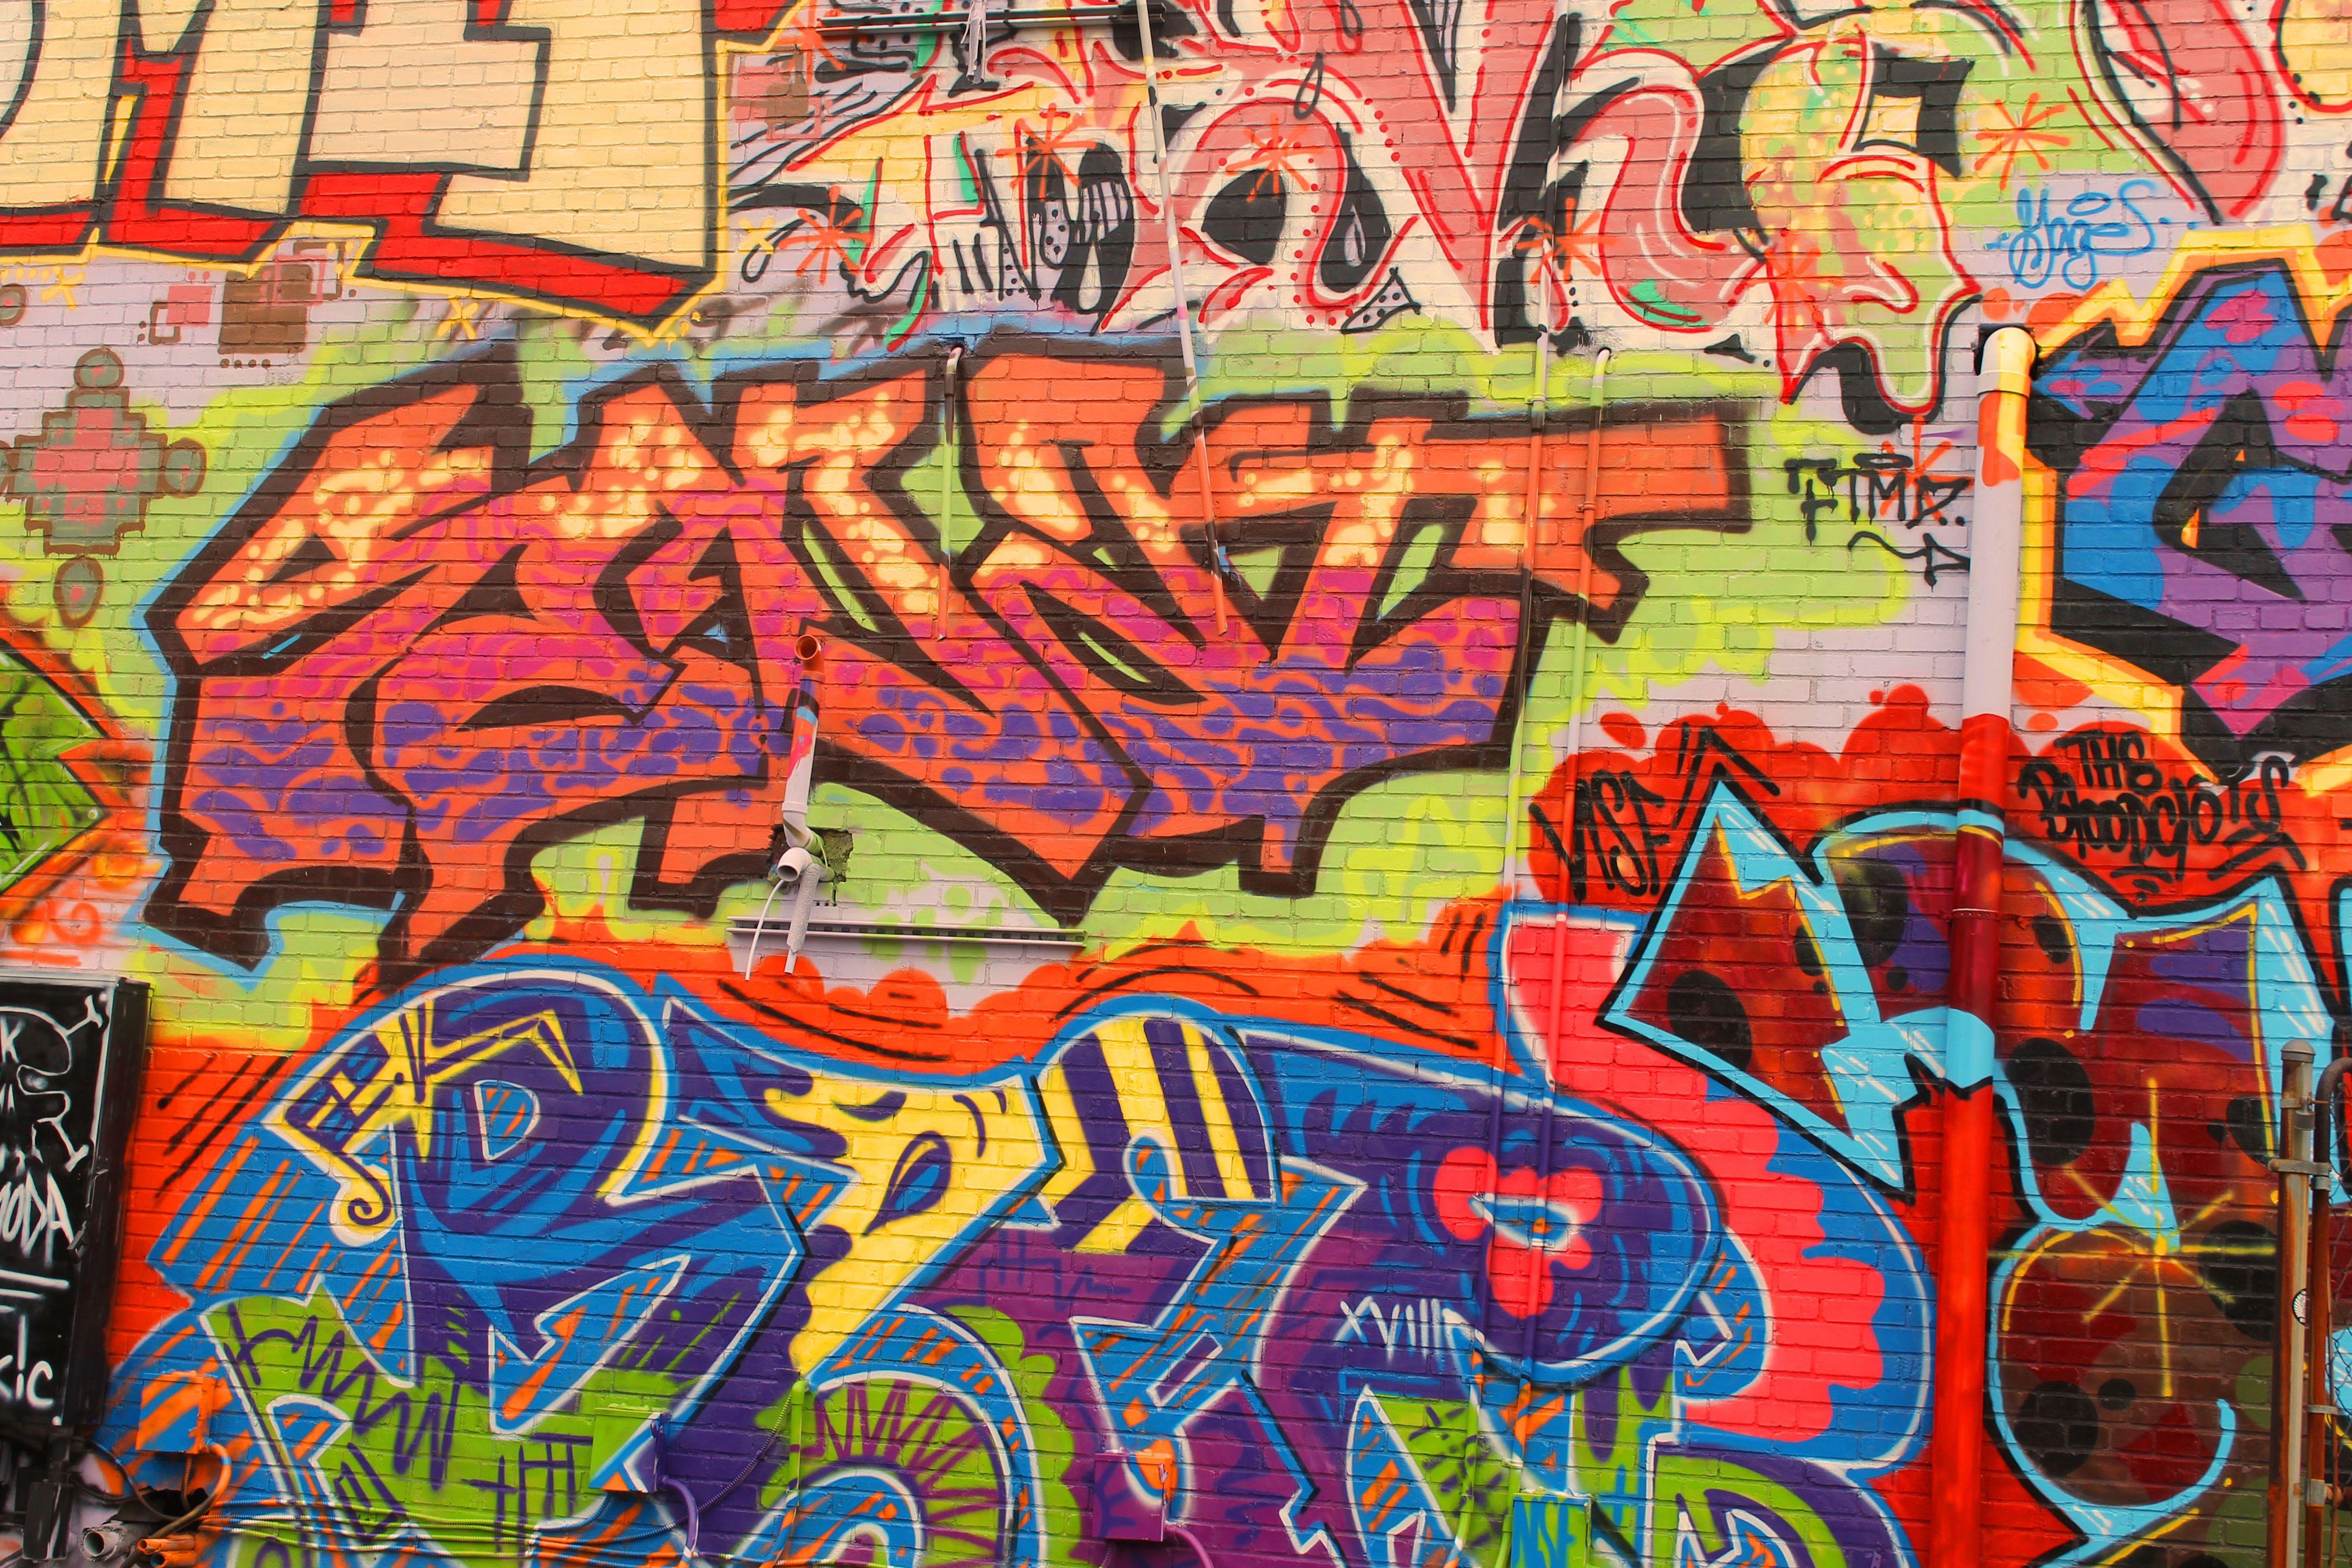 Gangster Mask Graffiti Wallpapers - Wallpaper Cave